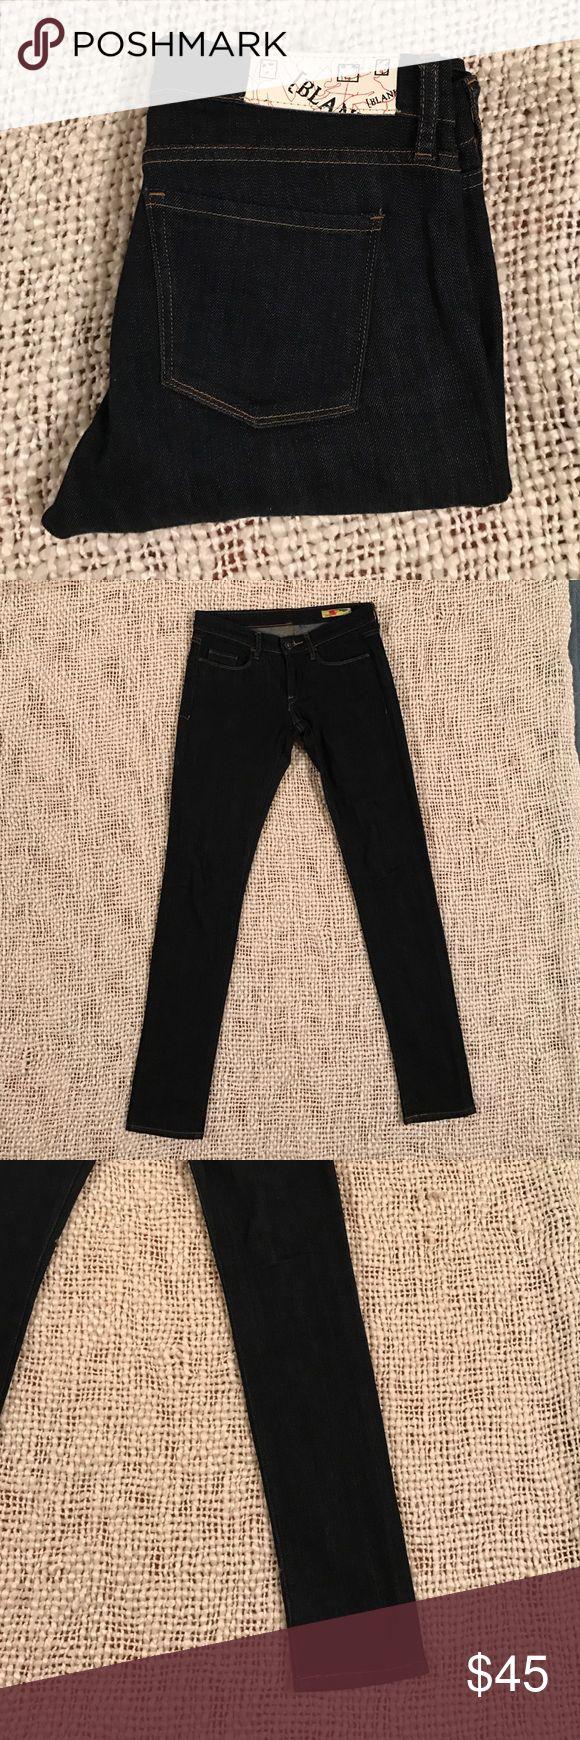 Blank Denim Jeans 27x32 skinny boot cut low rise Amazing pair of dark wash Blank Denim Jeans 27x32. Skinny boot cut with no wear to heels. Blank Denim Jeans